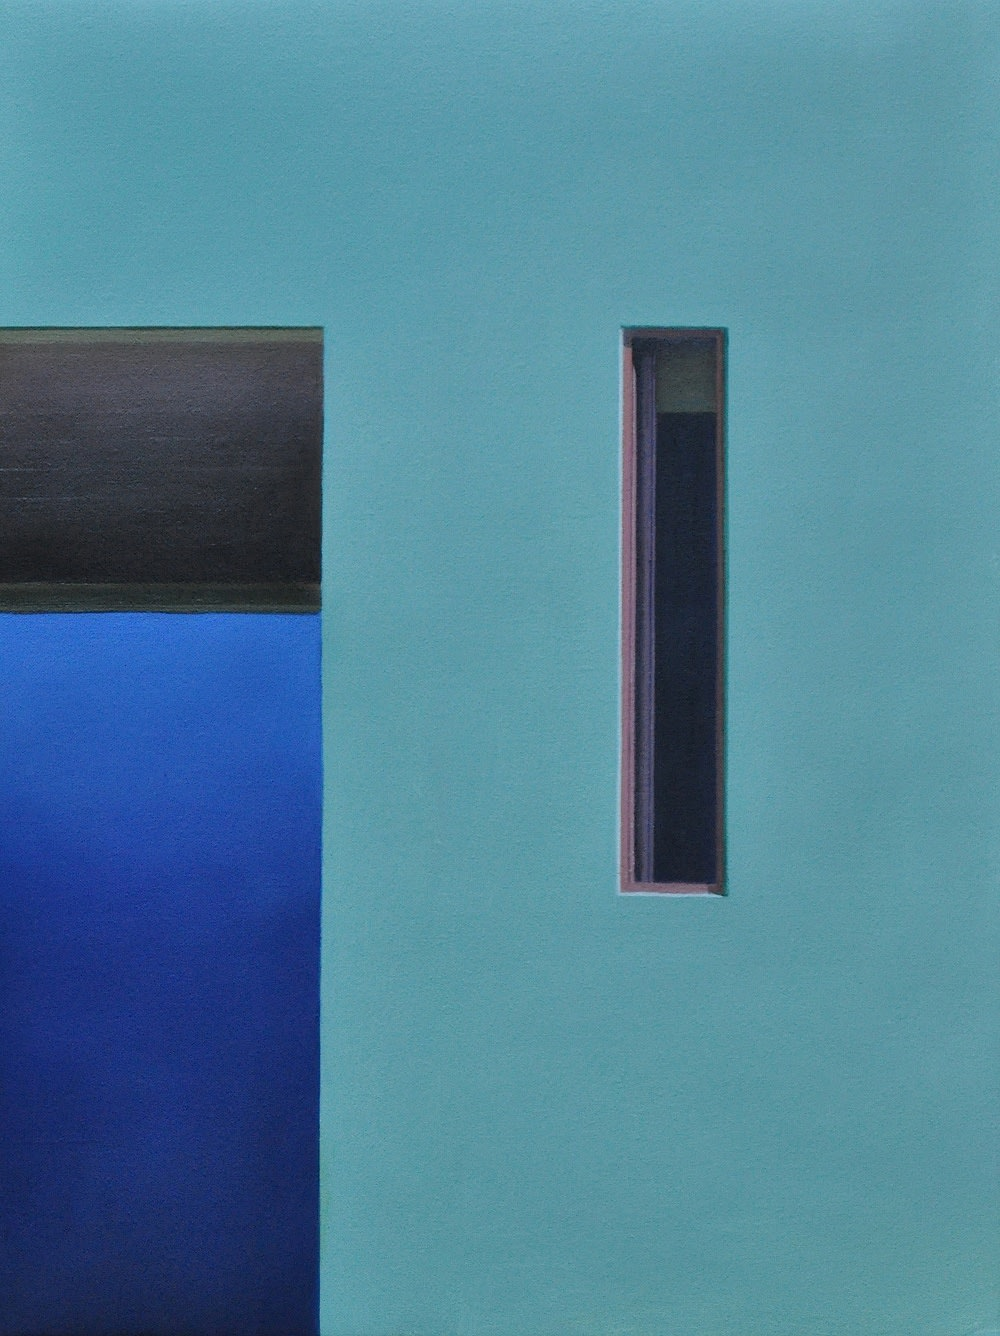 Carl Laubin Gratte-Ciel Window, 2014 Oil on canvas 41 x 30 cm